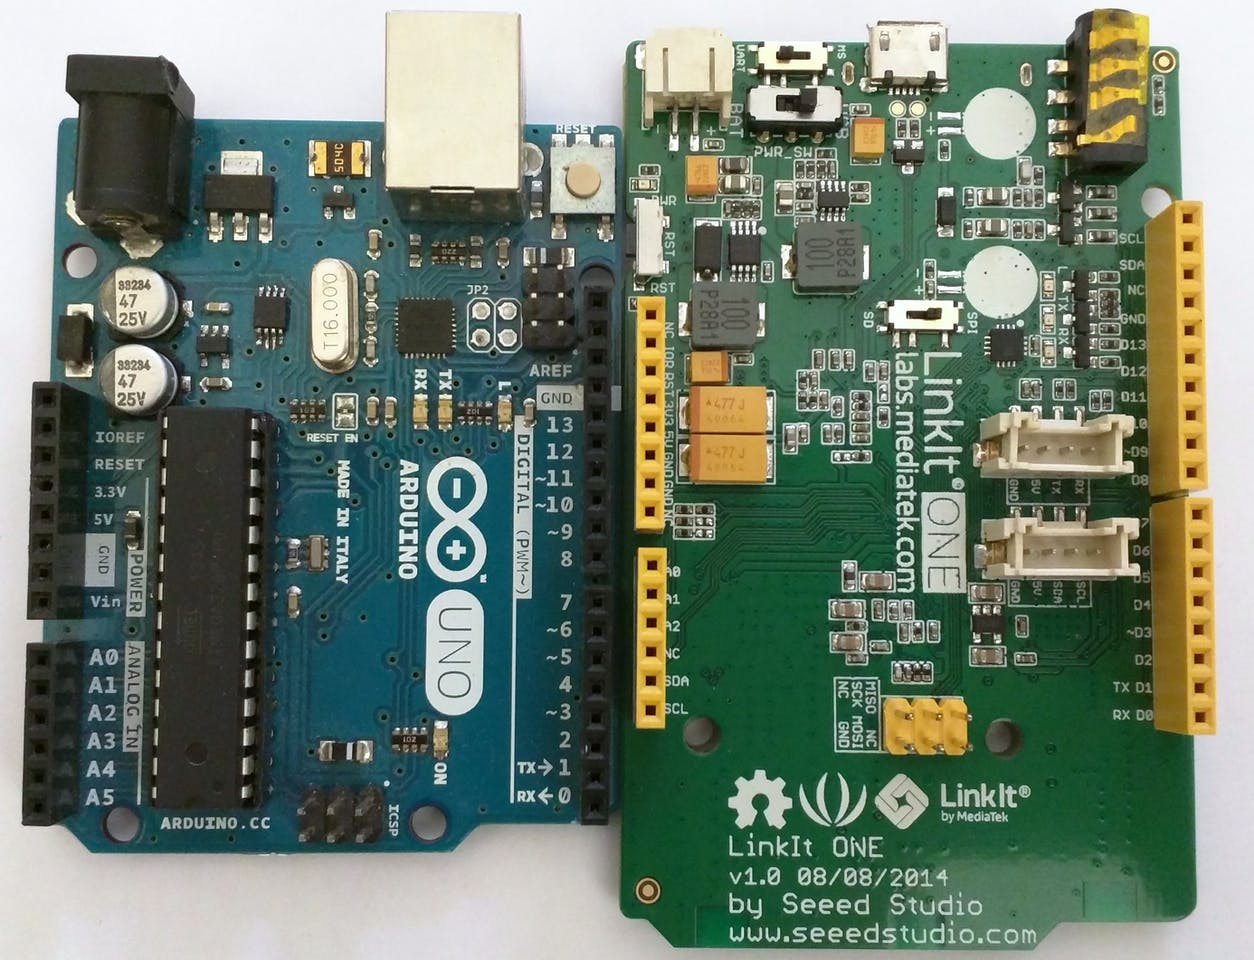 Linkit Ultimate Iot Stripboard Relay Shield Circuit Diagram Click For A Bigger Image